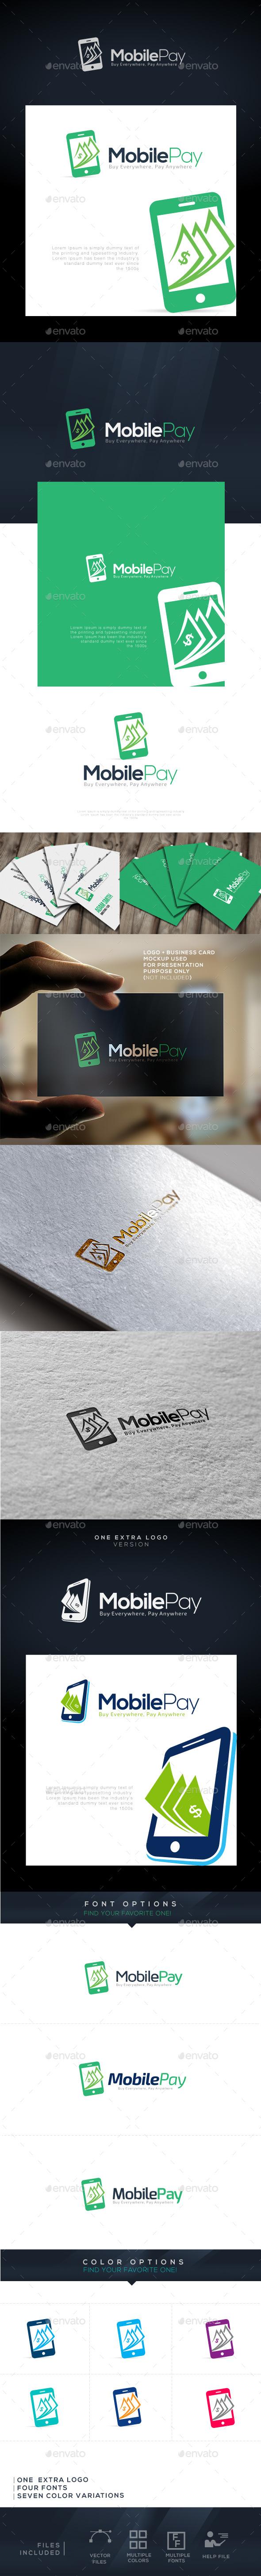 MobilePay - Symbols Logo Templates